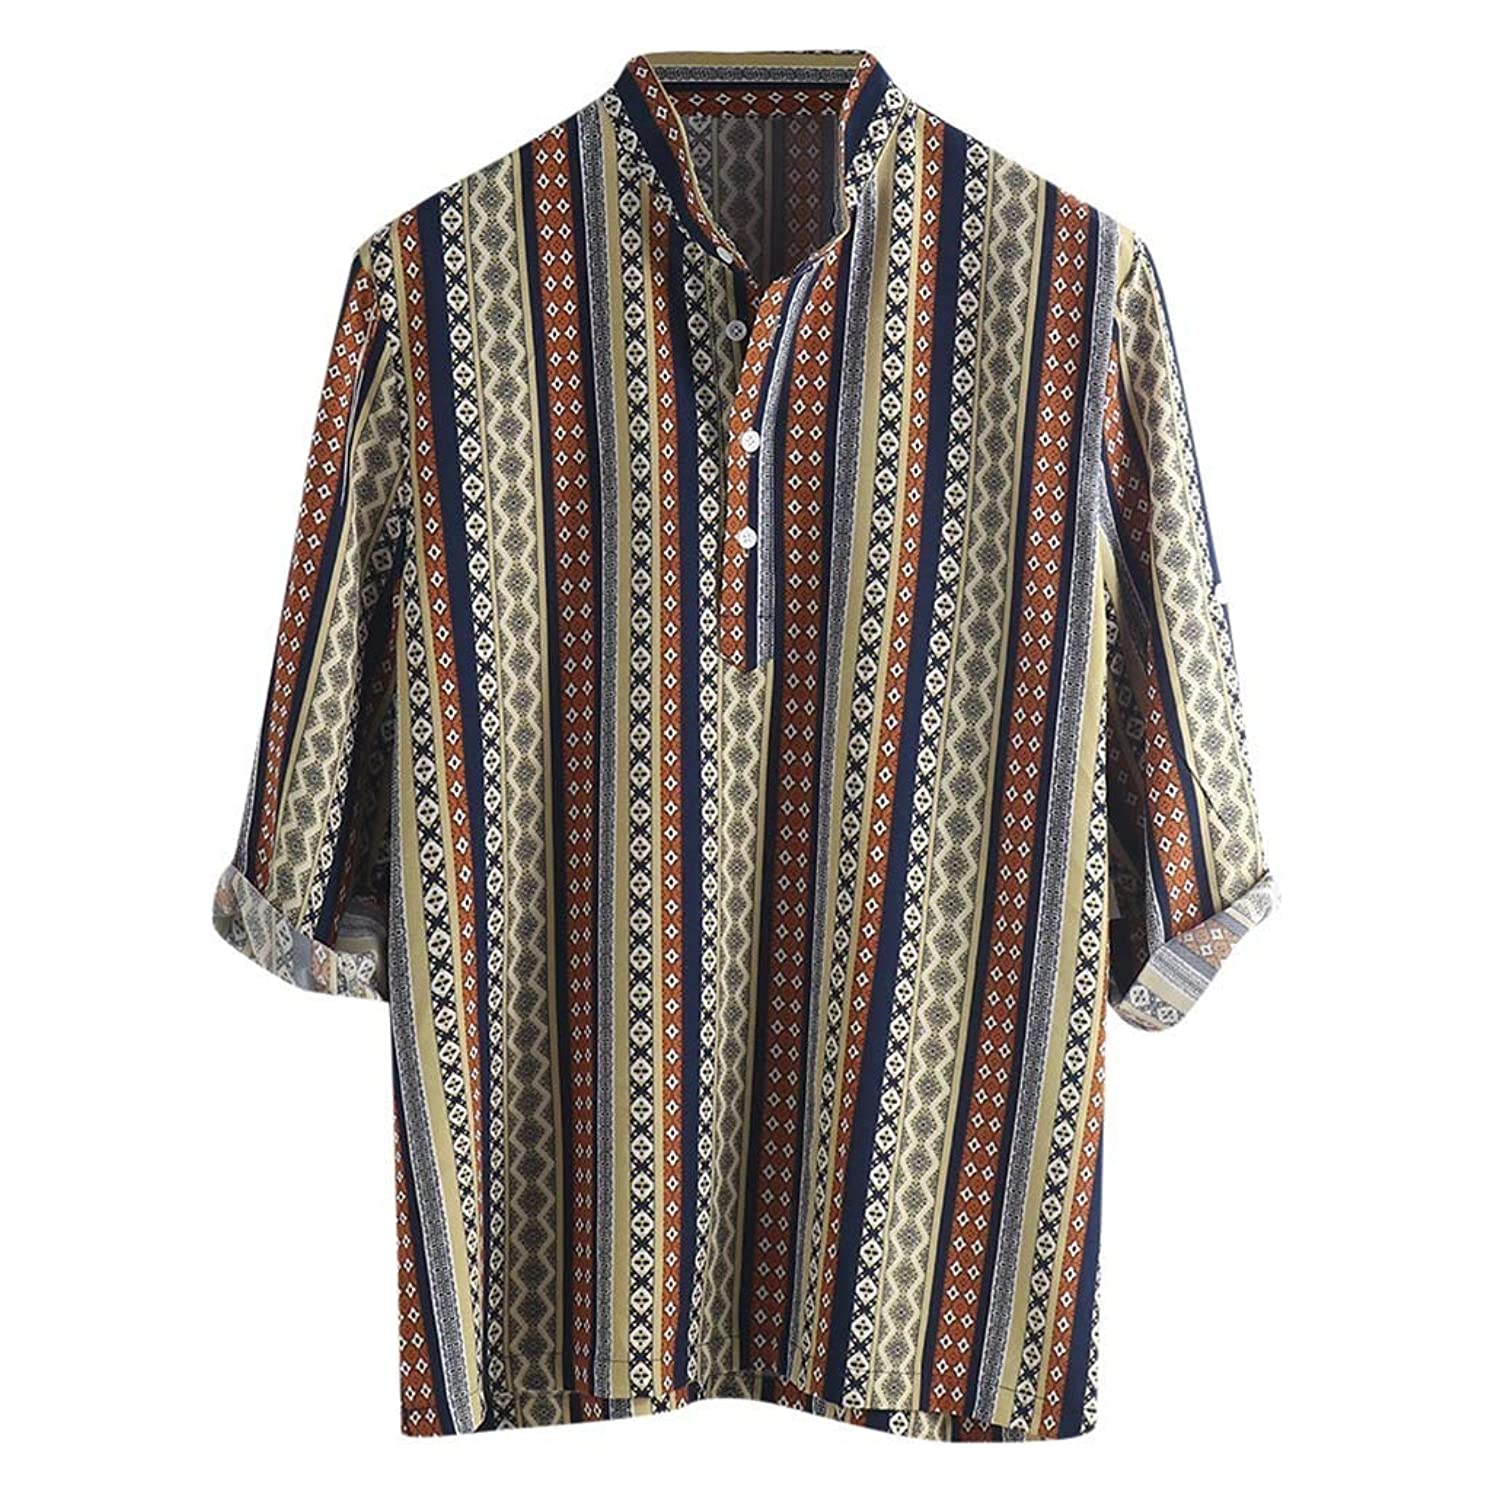 Men Henley Shirts, Beautyfine Ethnic Pattern Printed Half Sleeve Blouse Striped Tops